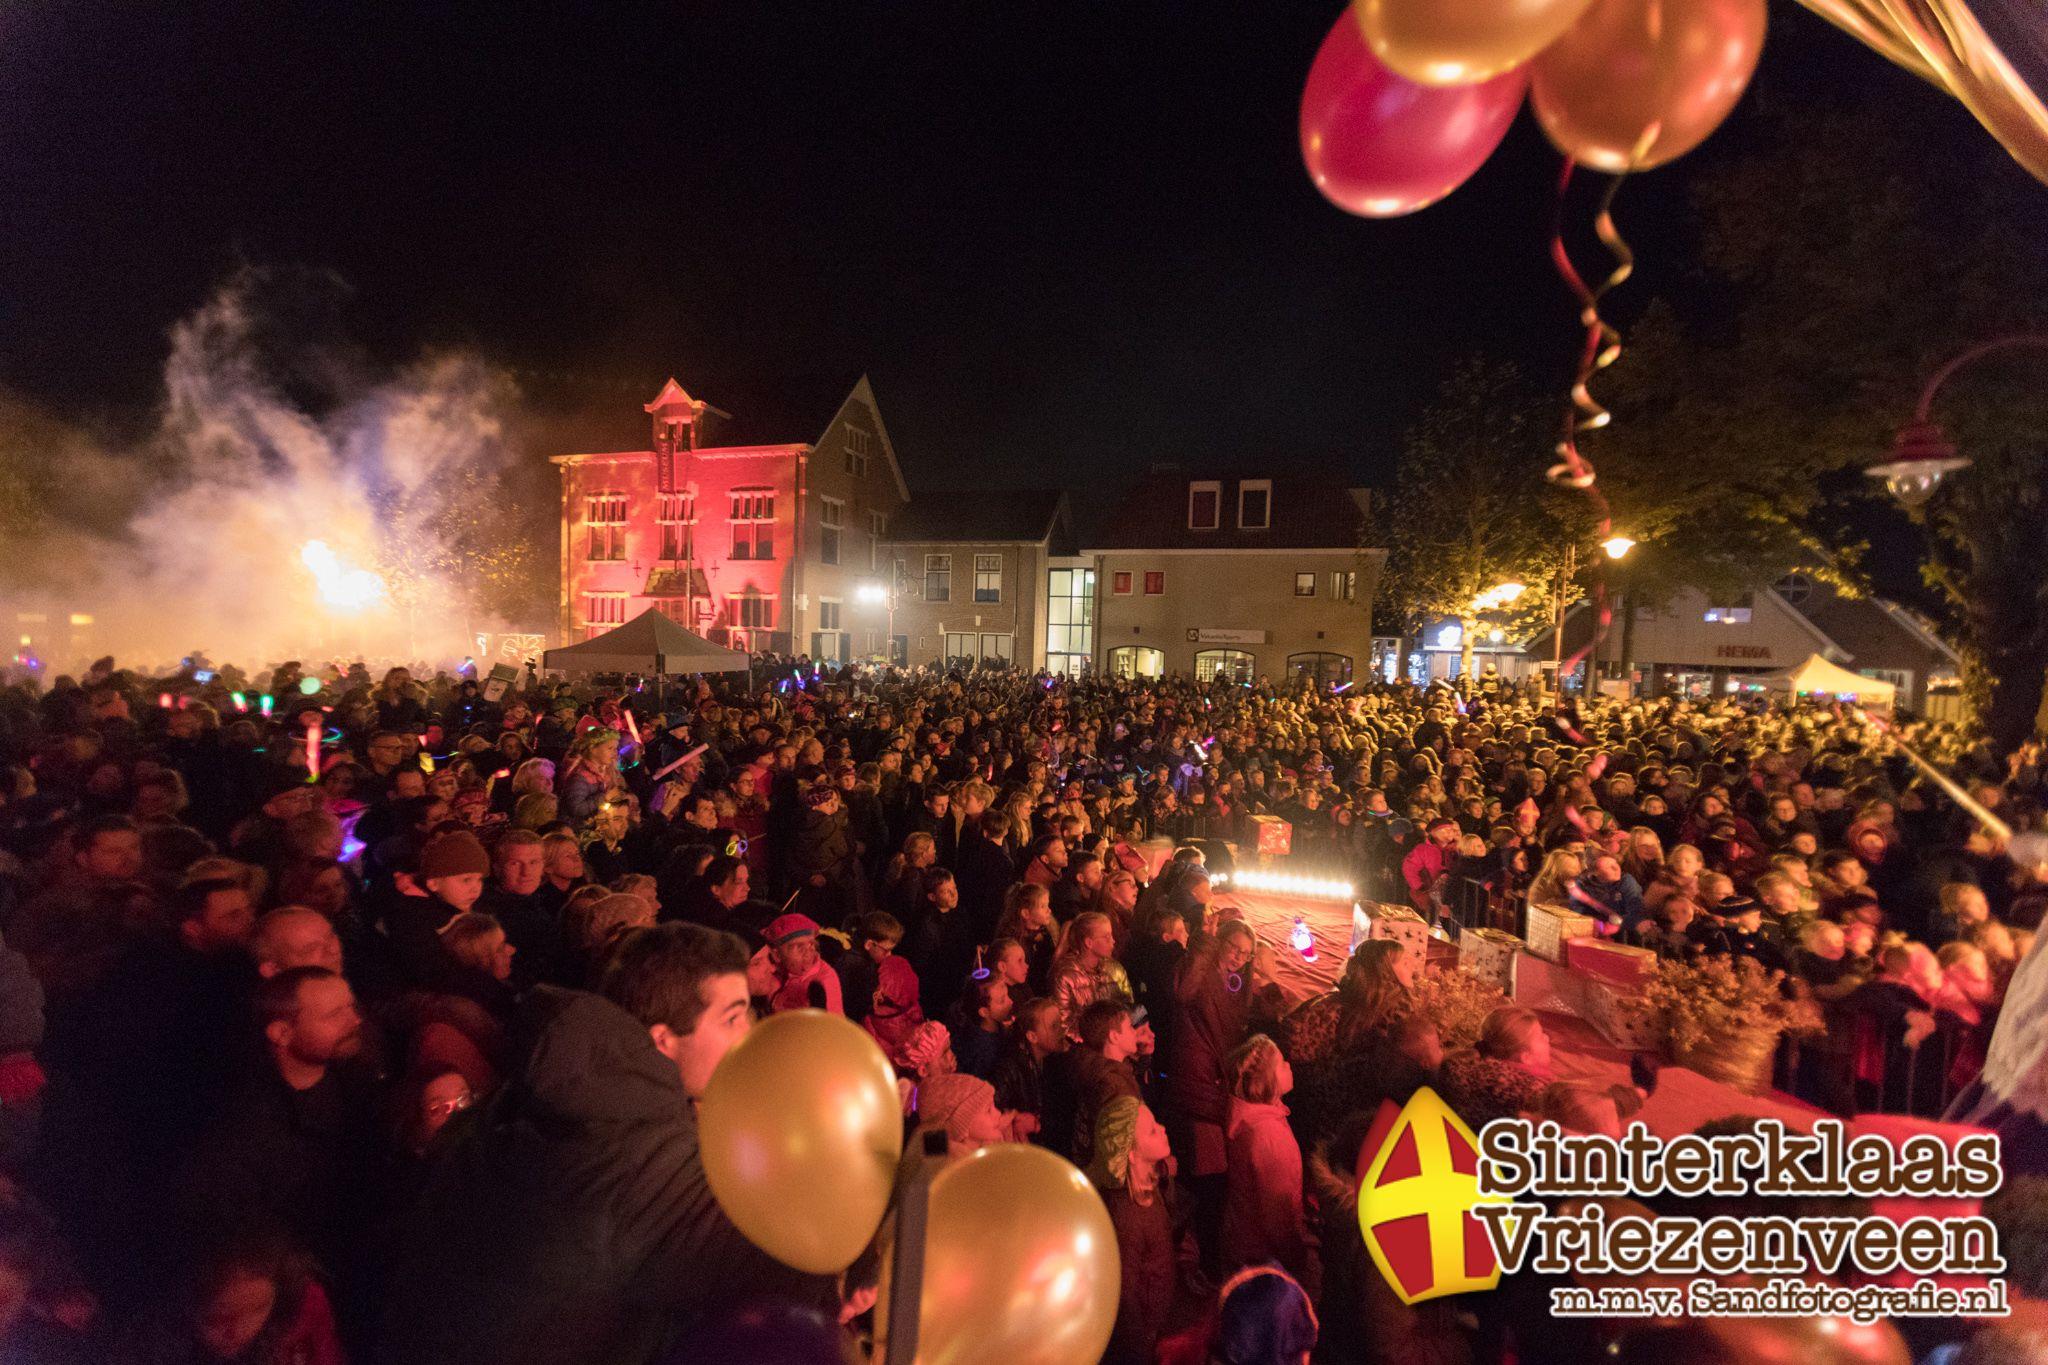 Sinterklaasintocht 16 november 2019 Vriezenveen Sand Fotografie